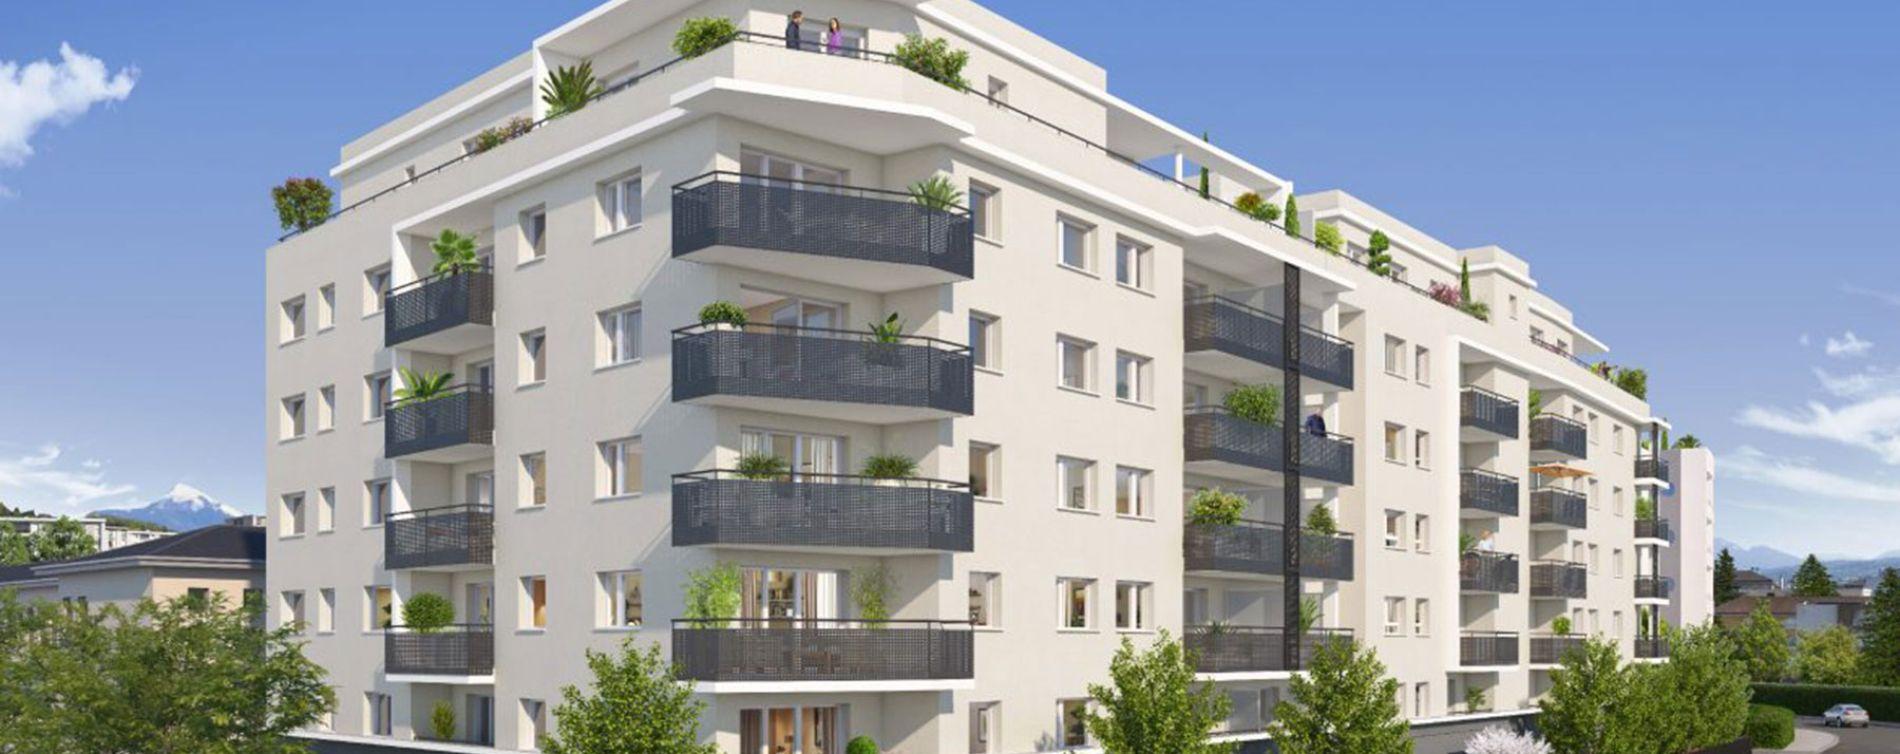 Annemasse : programme immobilier neuve « Shiro » (2)